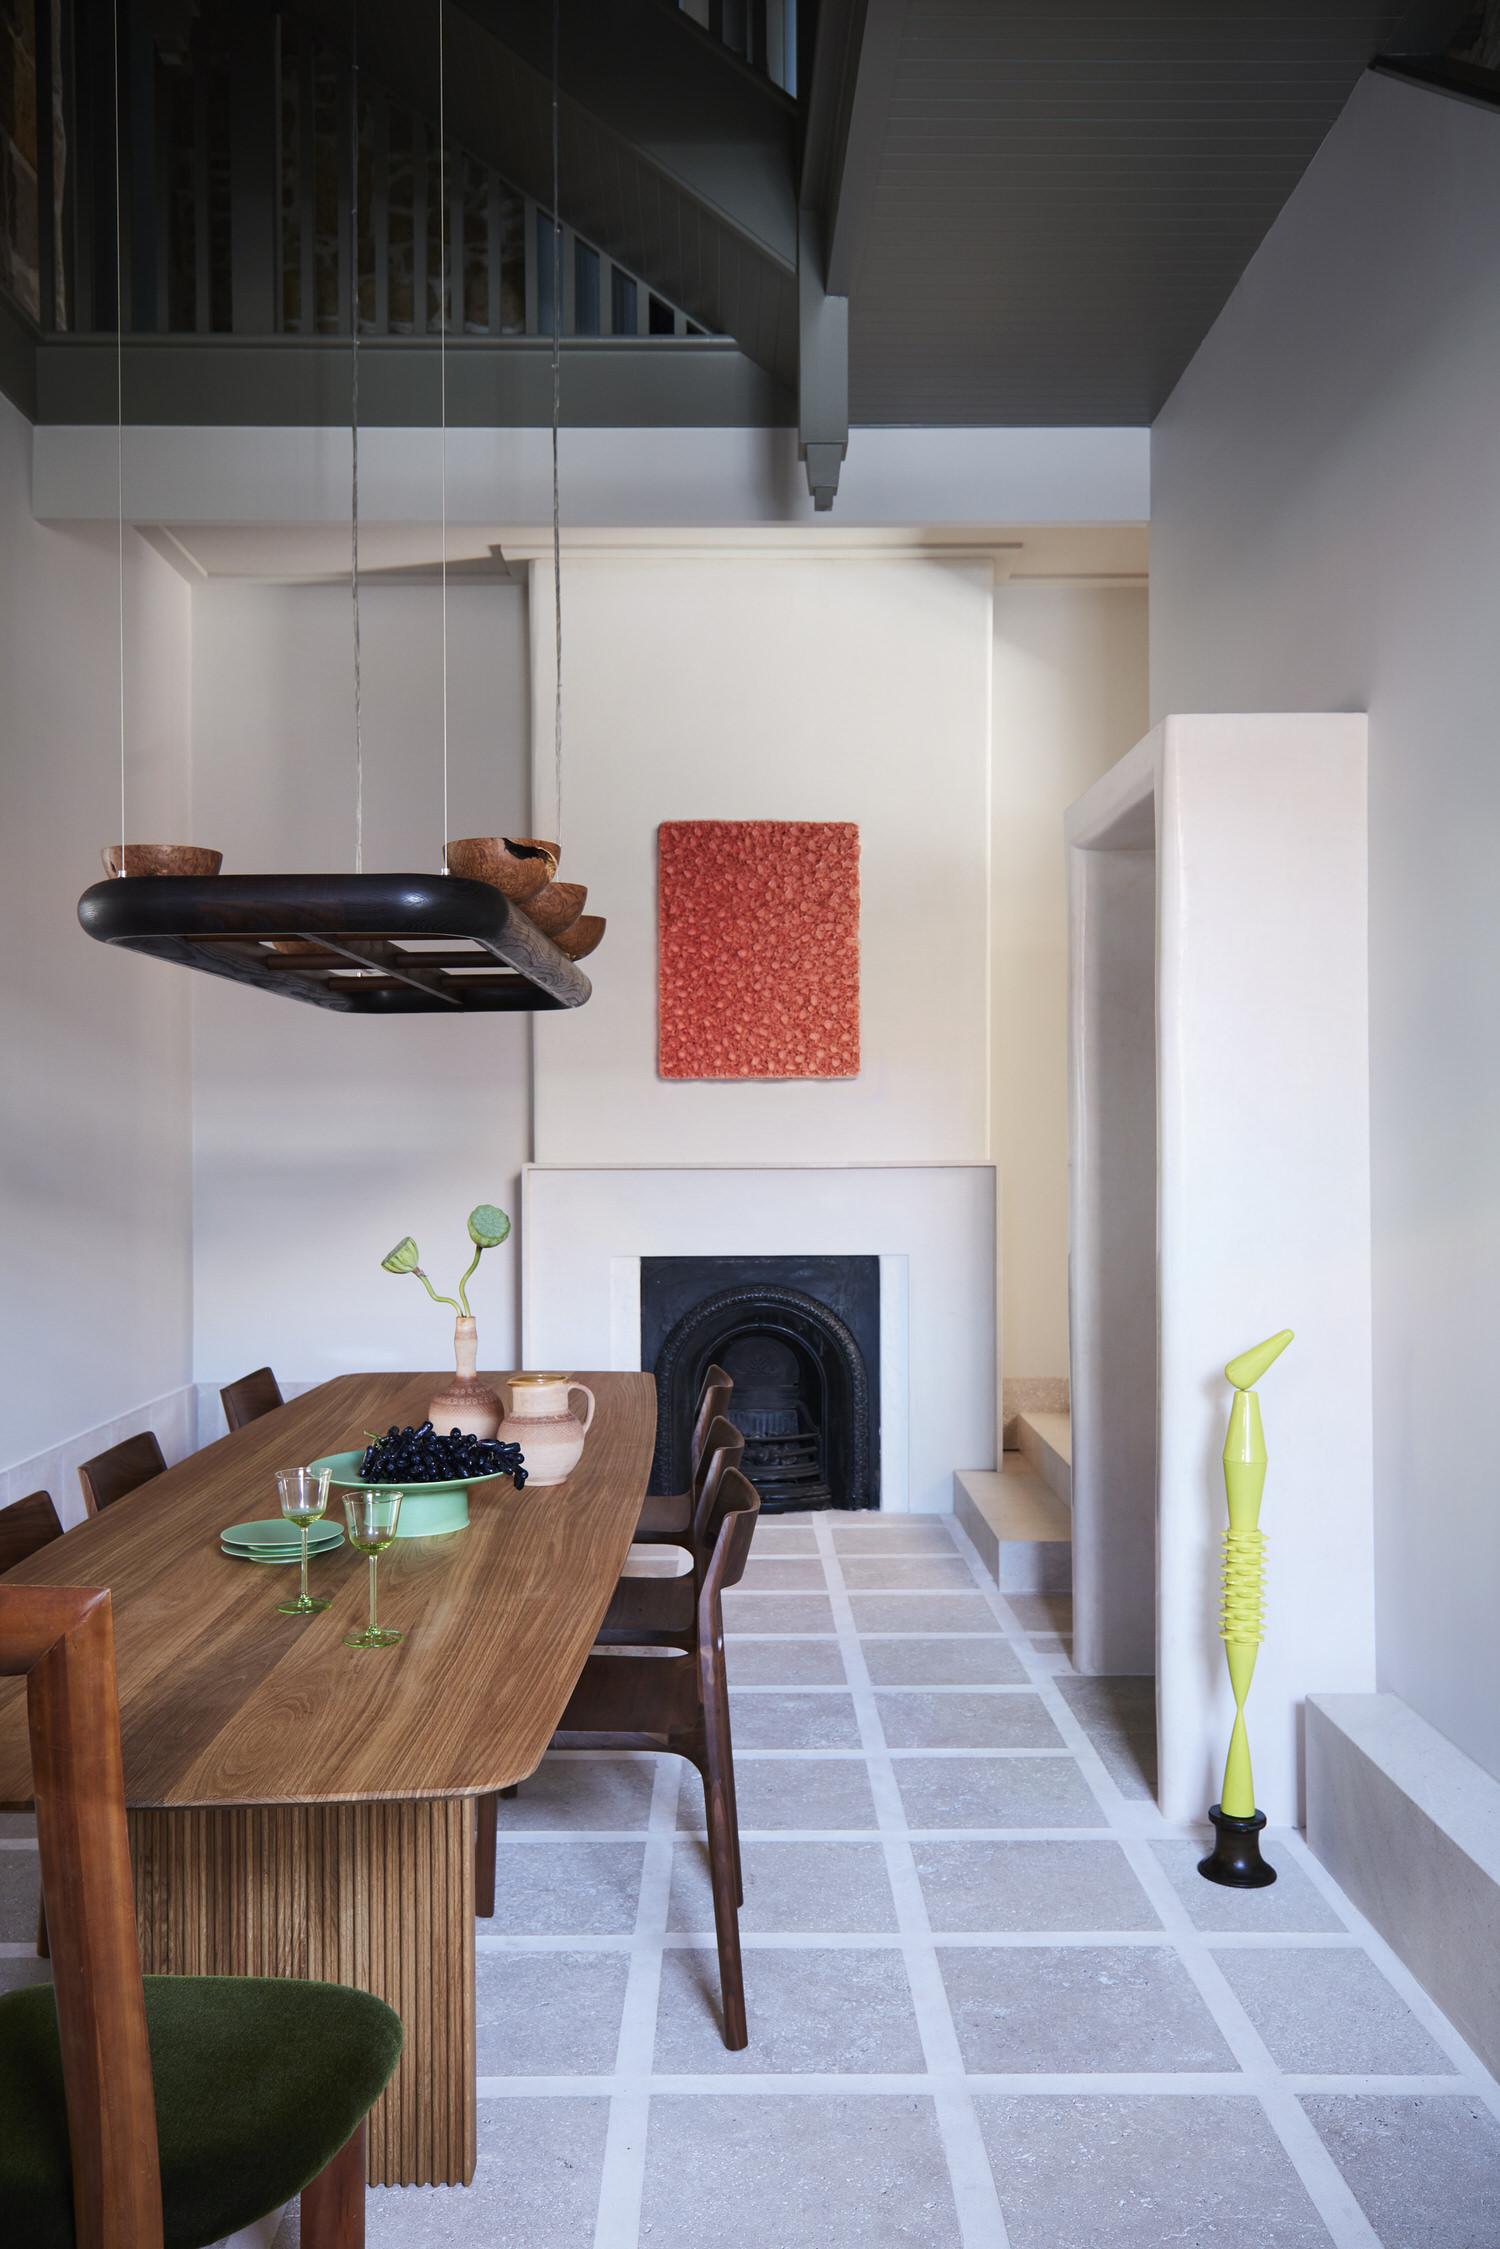 Ysg Studio Soft Serve 75 Evans St Rozelle Sydney Property Photo Prue Ruscoe Yellowtrace 10